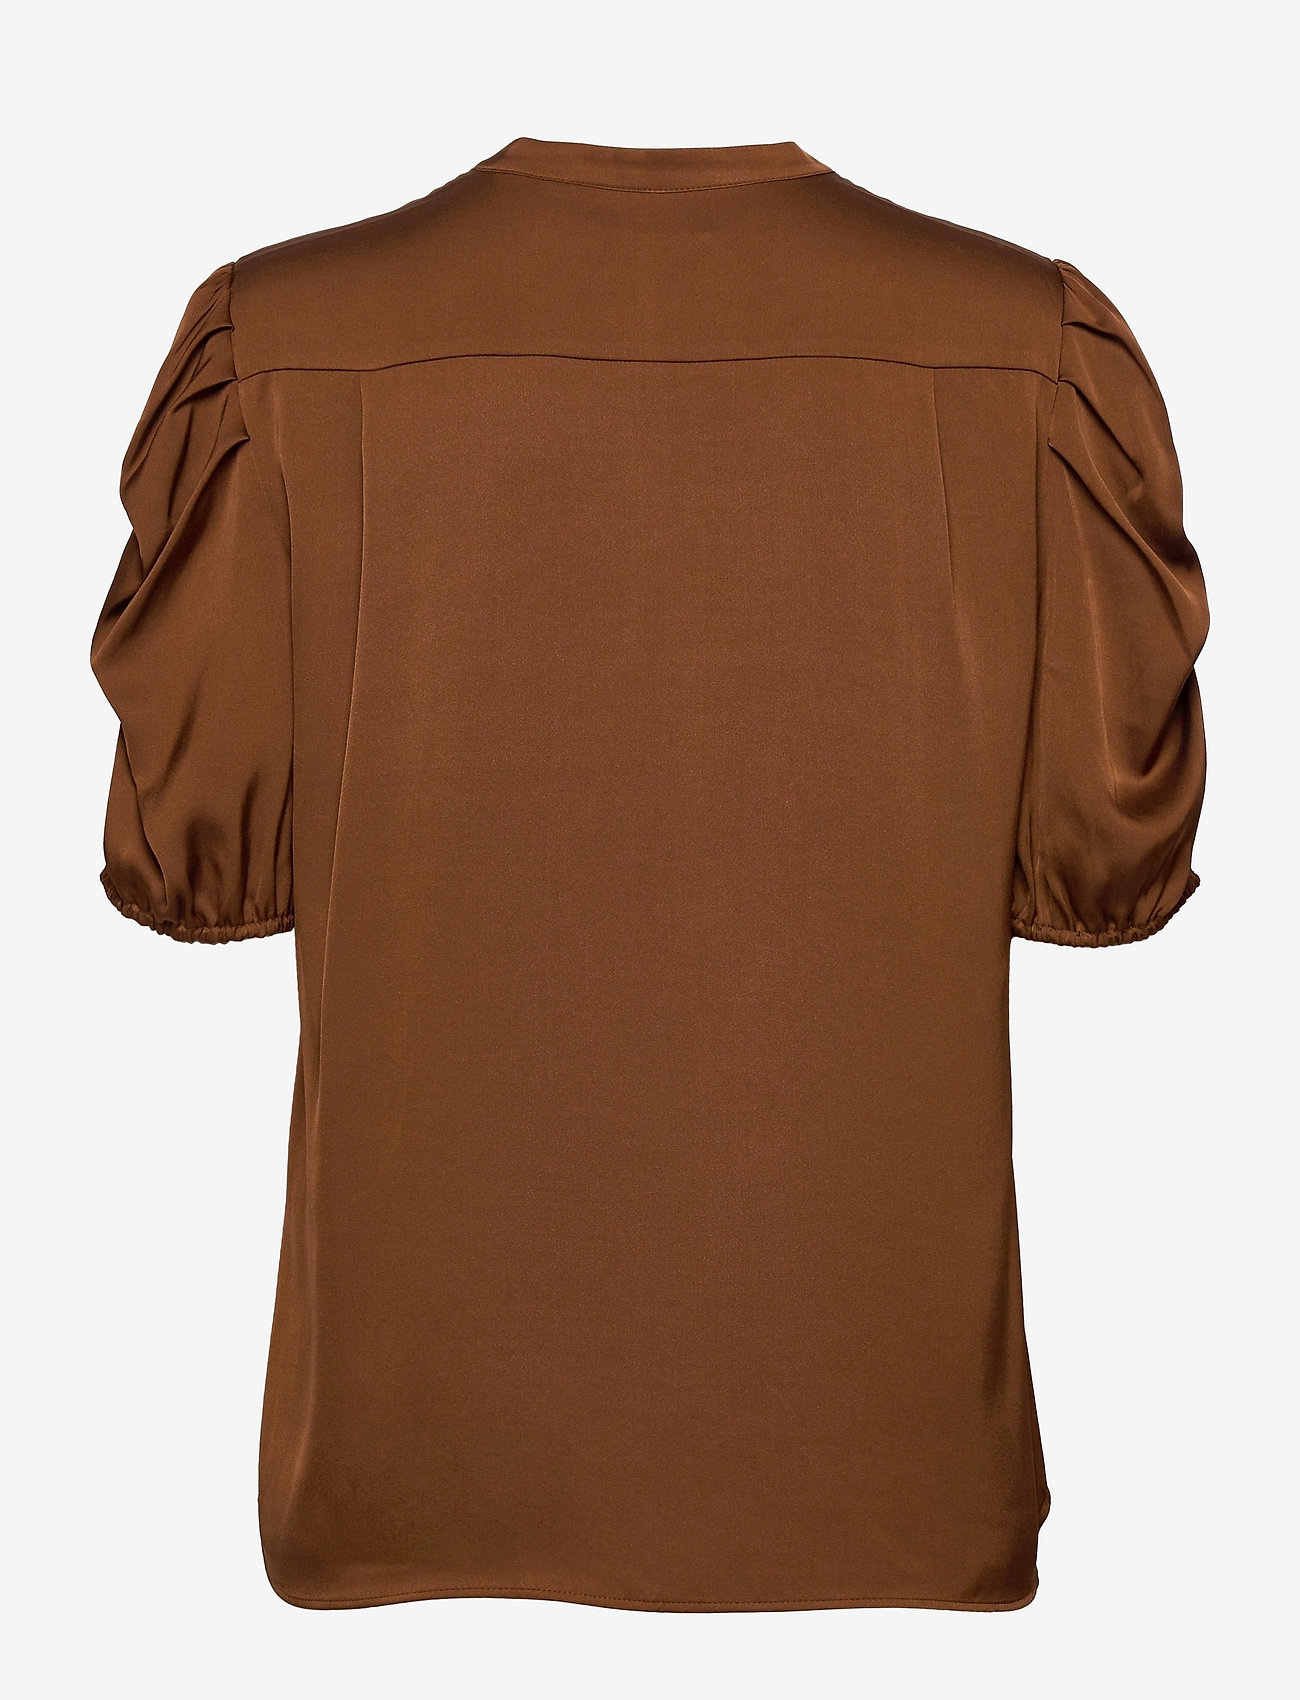 SAND - Satin Stretch - Naolin - blouses met korte mouwen - copper - 1